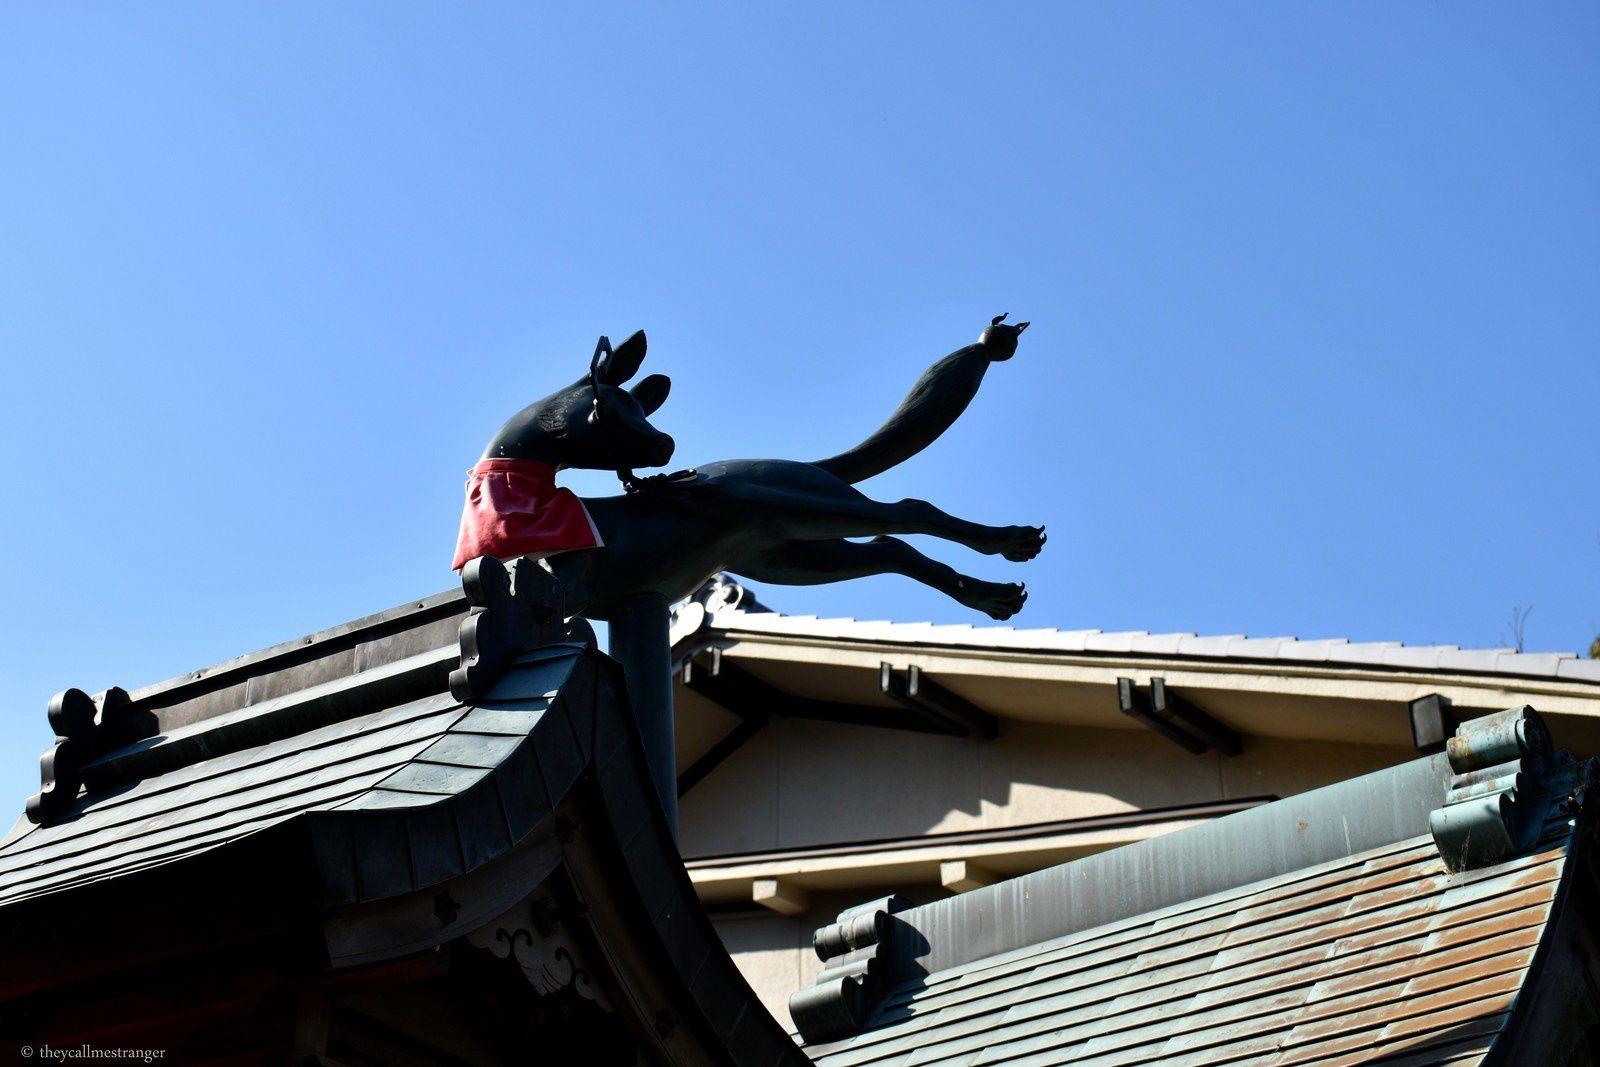 Fushimi Inari Taisha, le sanctuaire aux milliers de torii, Kyoto